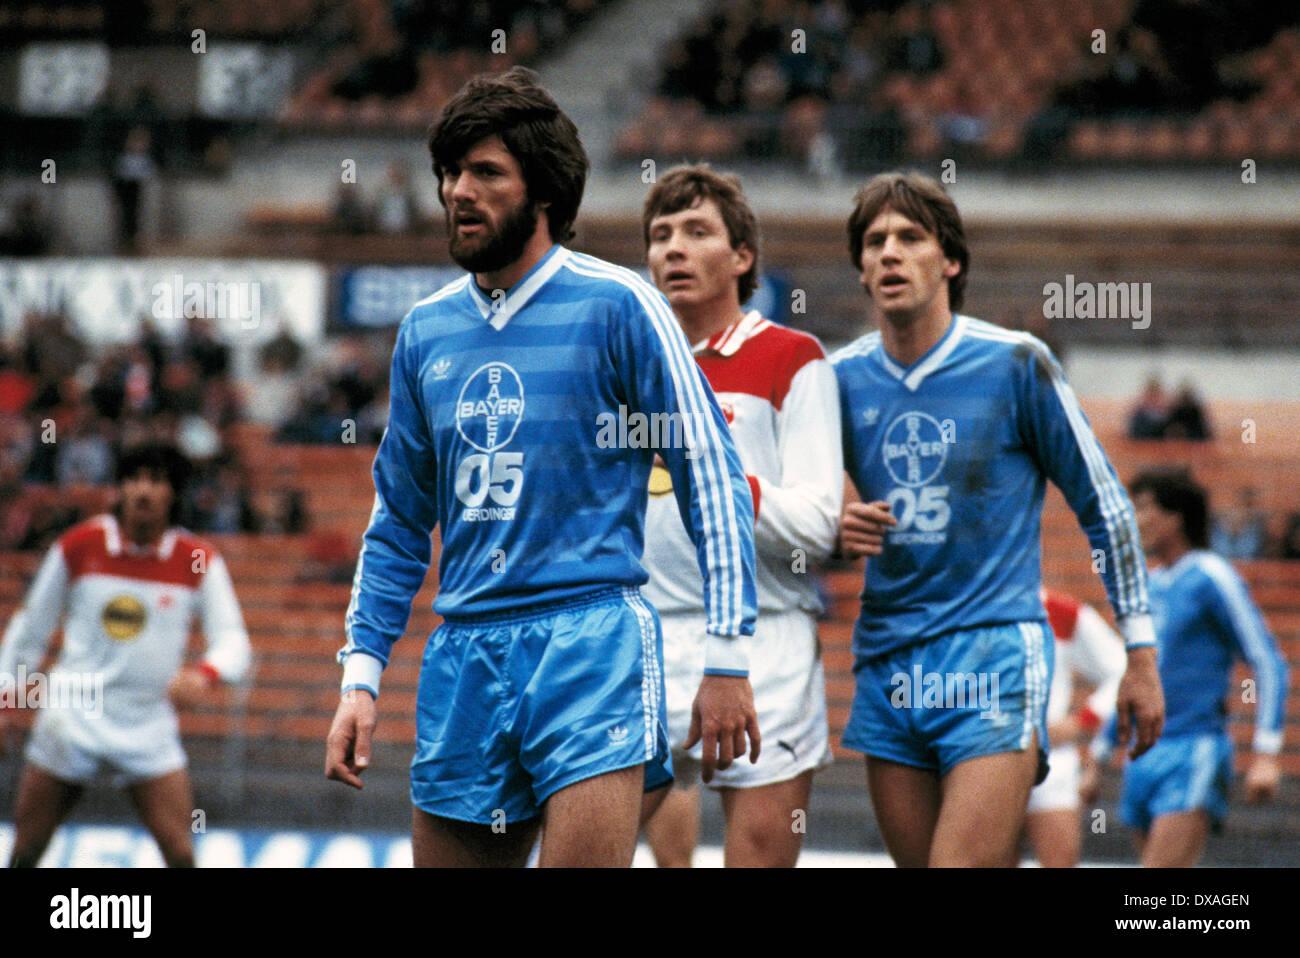 football, Bundesliga, 1984/1985, Rhine Stadium, Fortuna Duesseldorf versus FC Bayer 05 Uerdingen 2:2, scene of the match, f.l.t.r. Friedhelm Funkel (Bayer), Atli Edvaldsson (Fortuna), Wolfgang Funkel (Bayer) - Stock Image